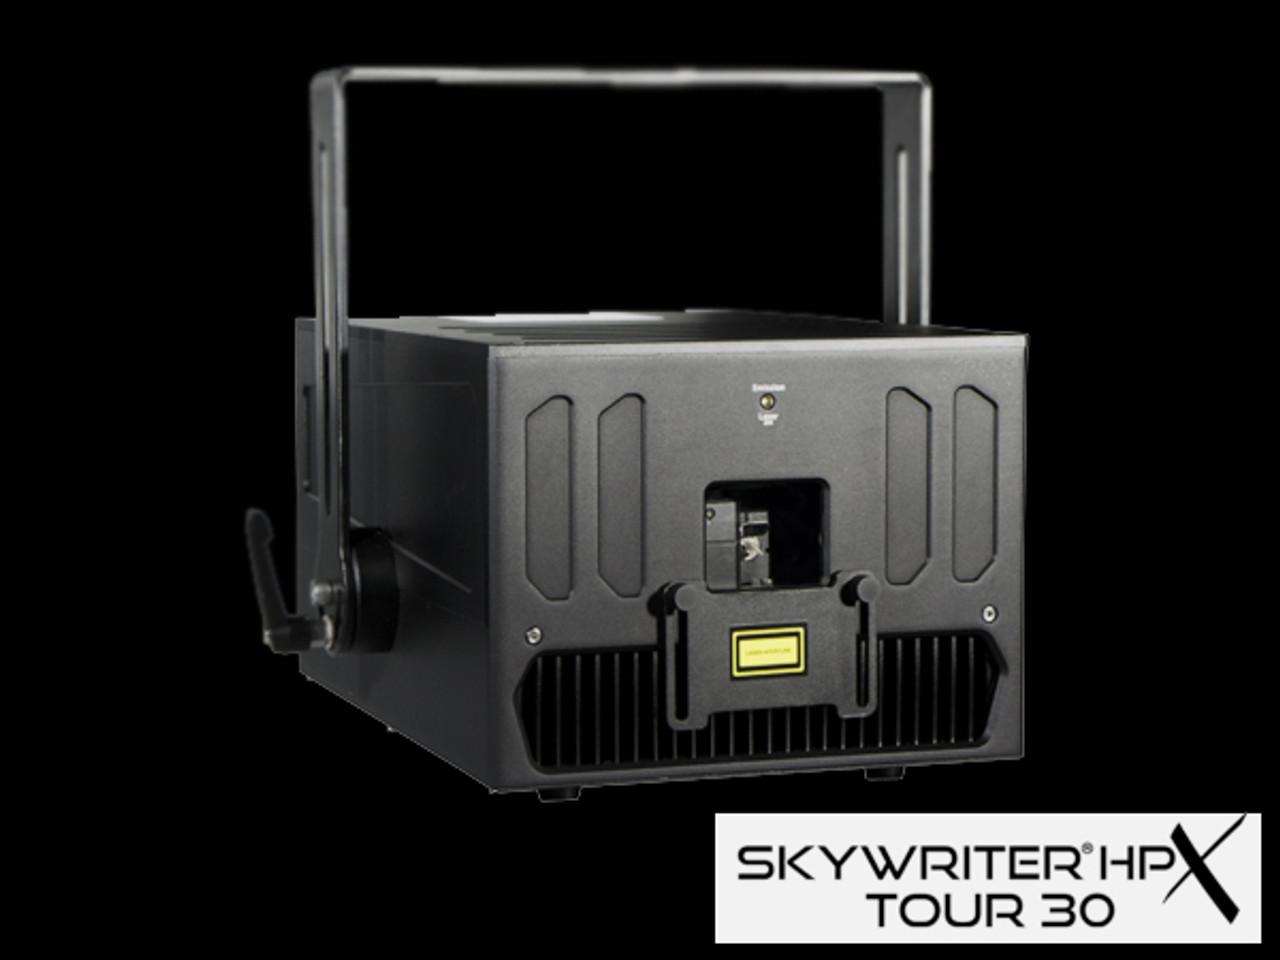 Skywriter HPX 30 (30W full RGB)